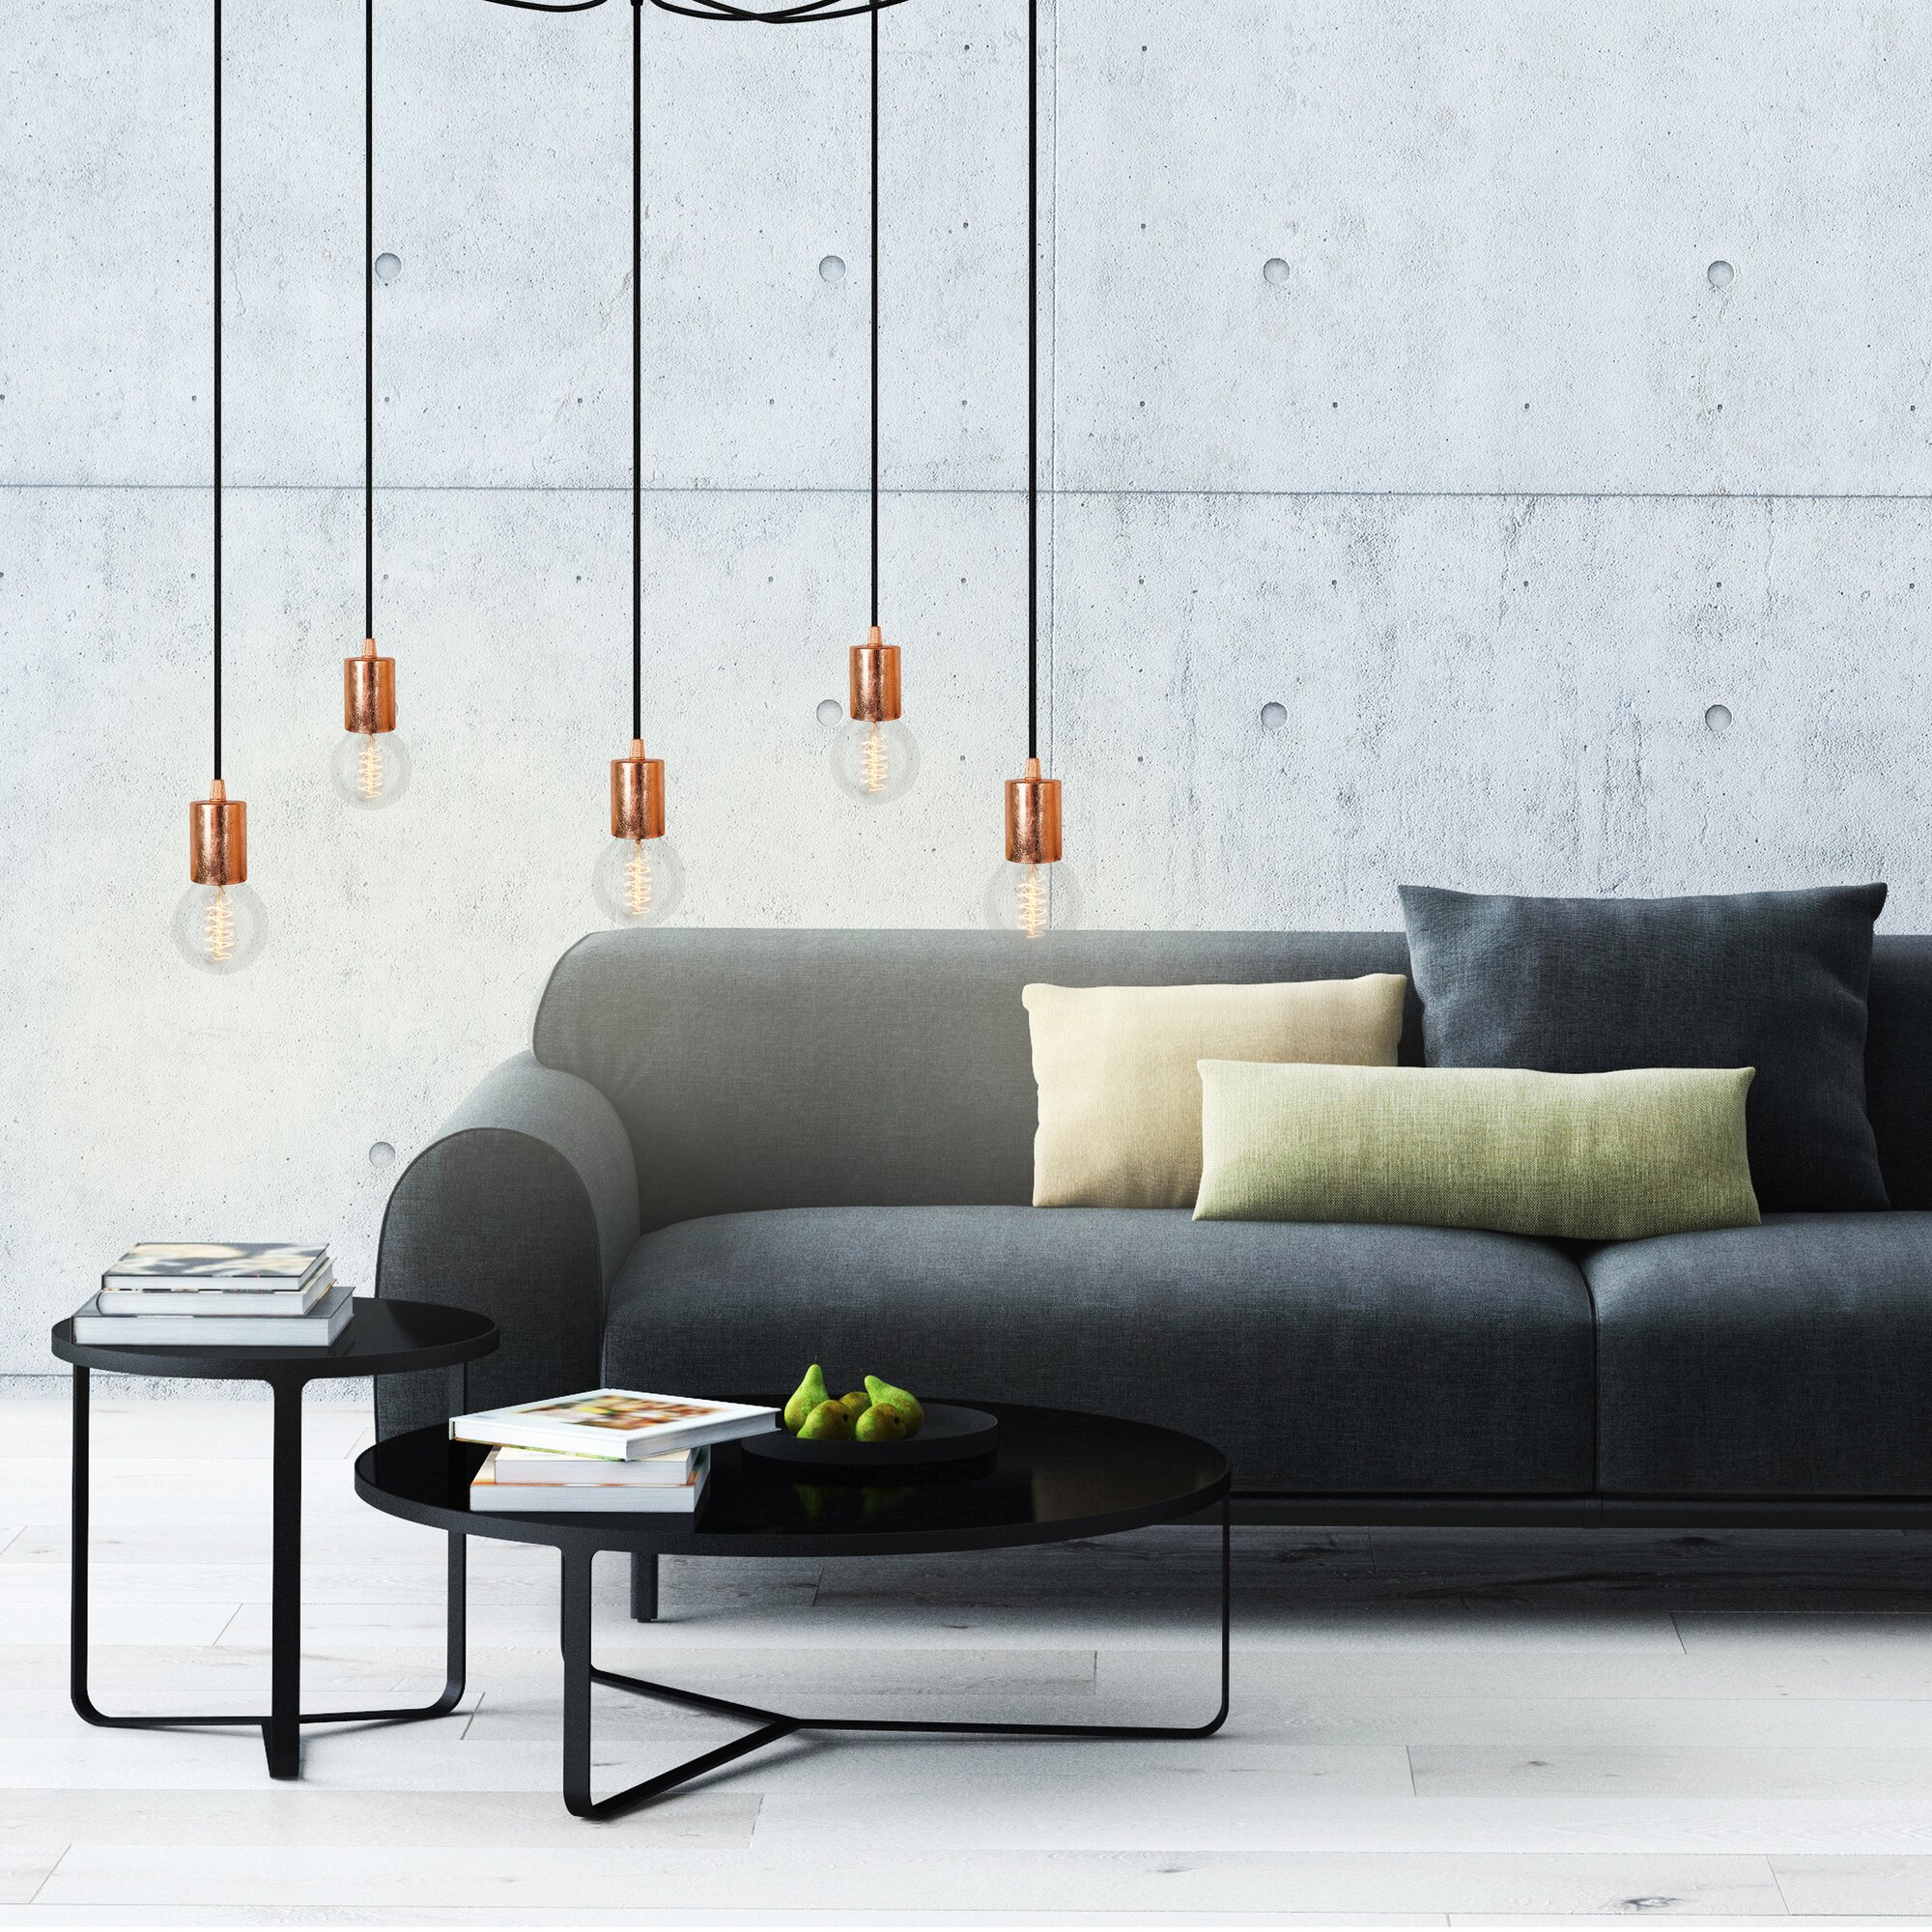 urban facettes kaskaden pendelleuchte 5 flammig cero bewertungen. Black Bedroom Furniture Sets. Home Design Ideas